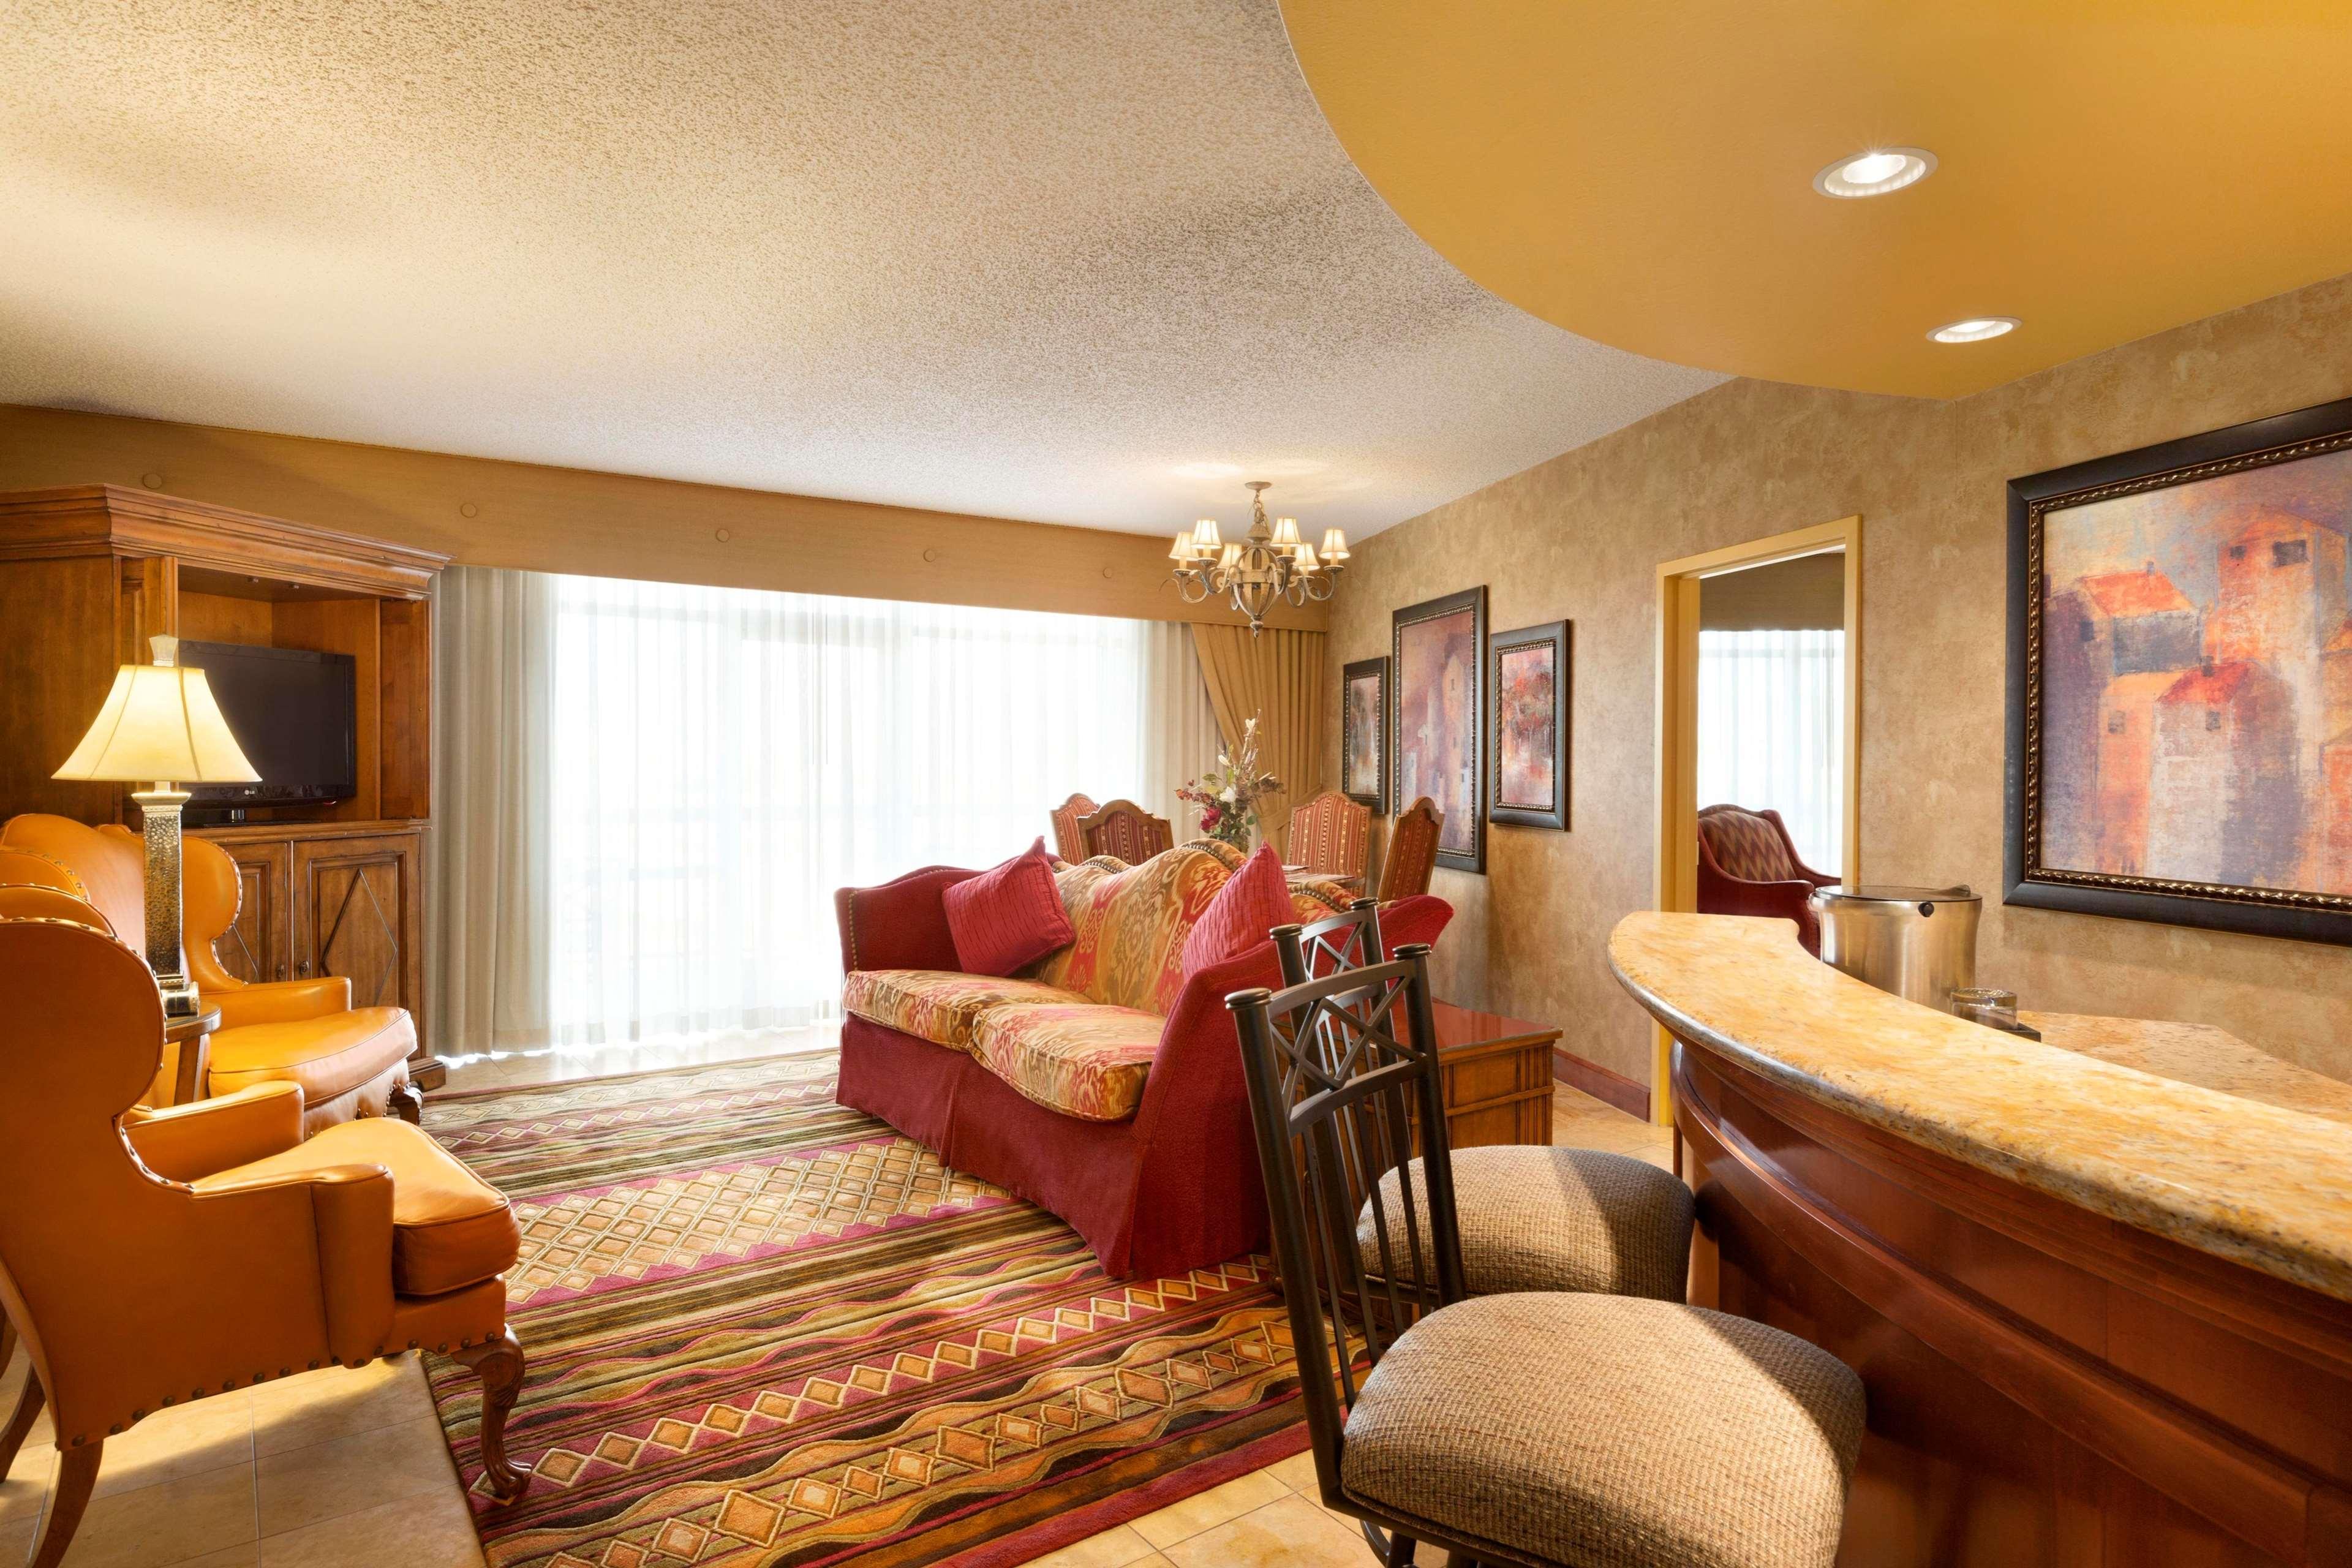 Embassy Suites by Hilton Albuquerque Hotel & Spa image 19